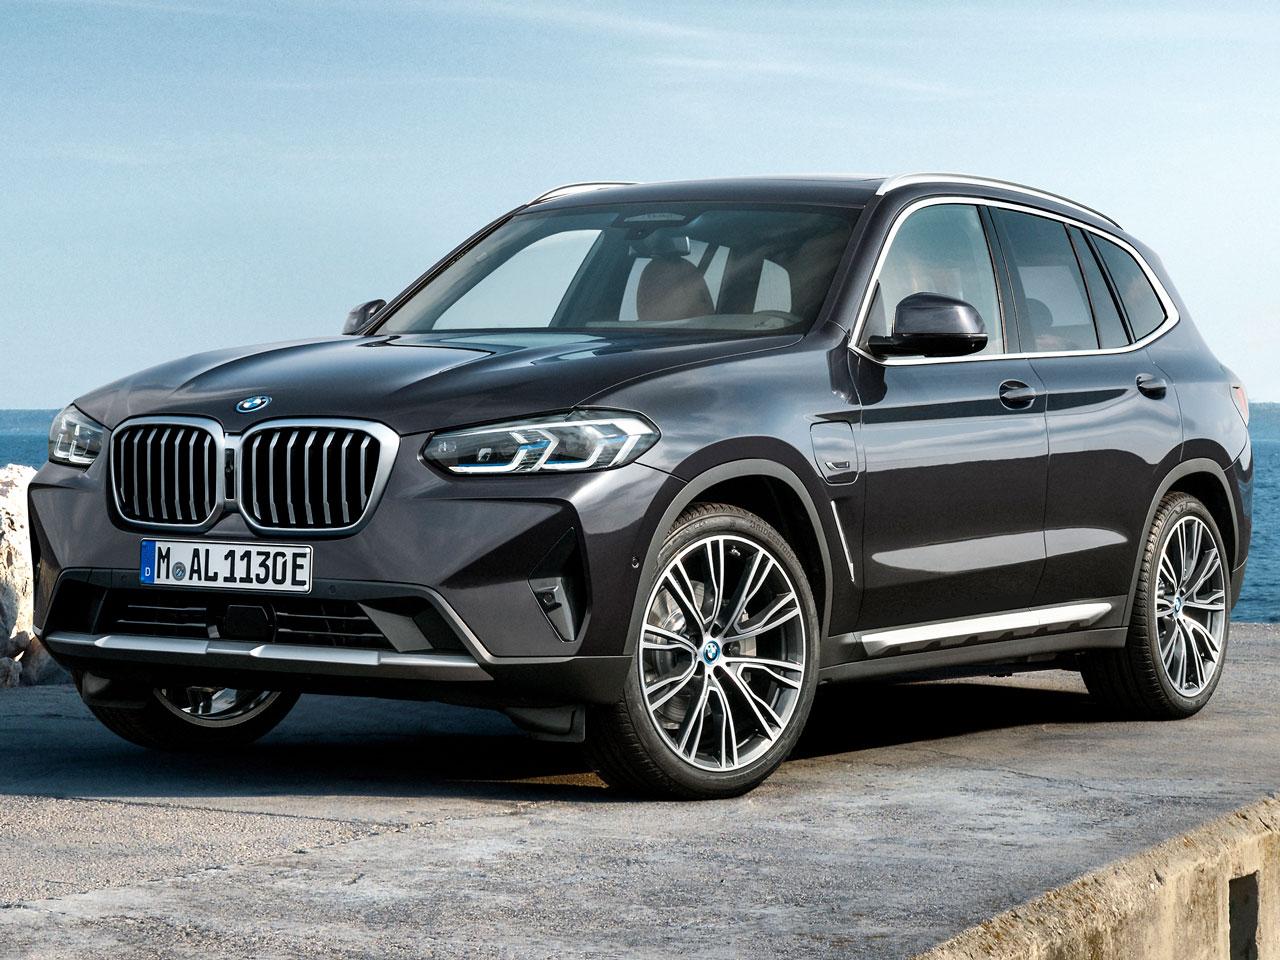 BMW X3 2017年モデル 新車画像